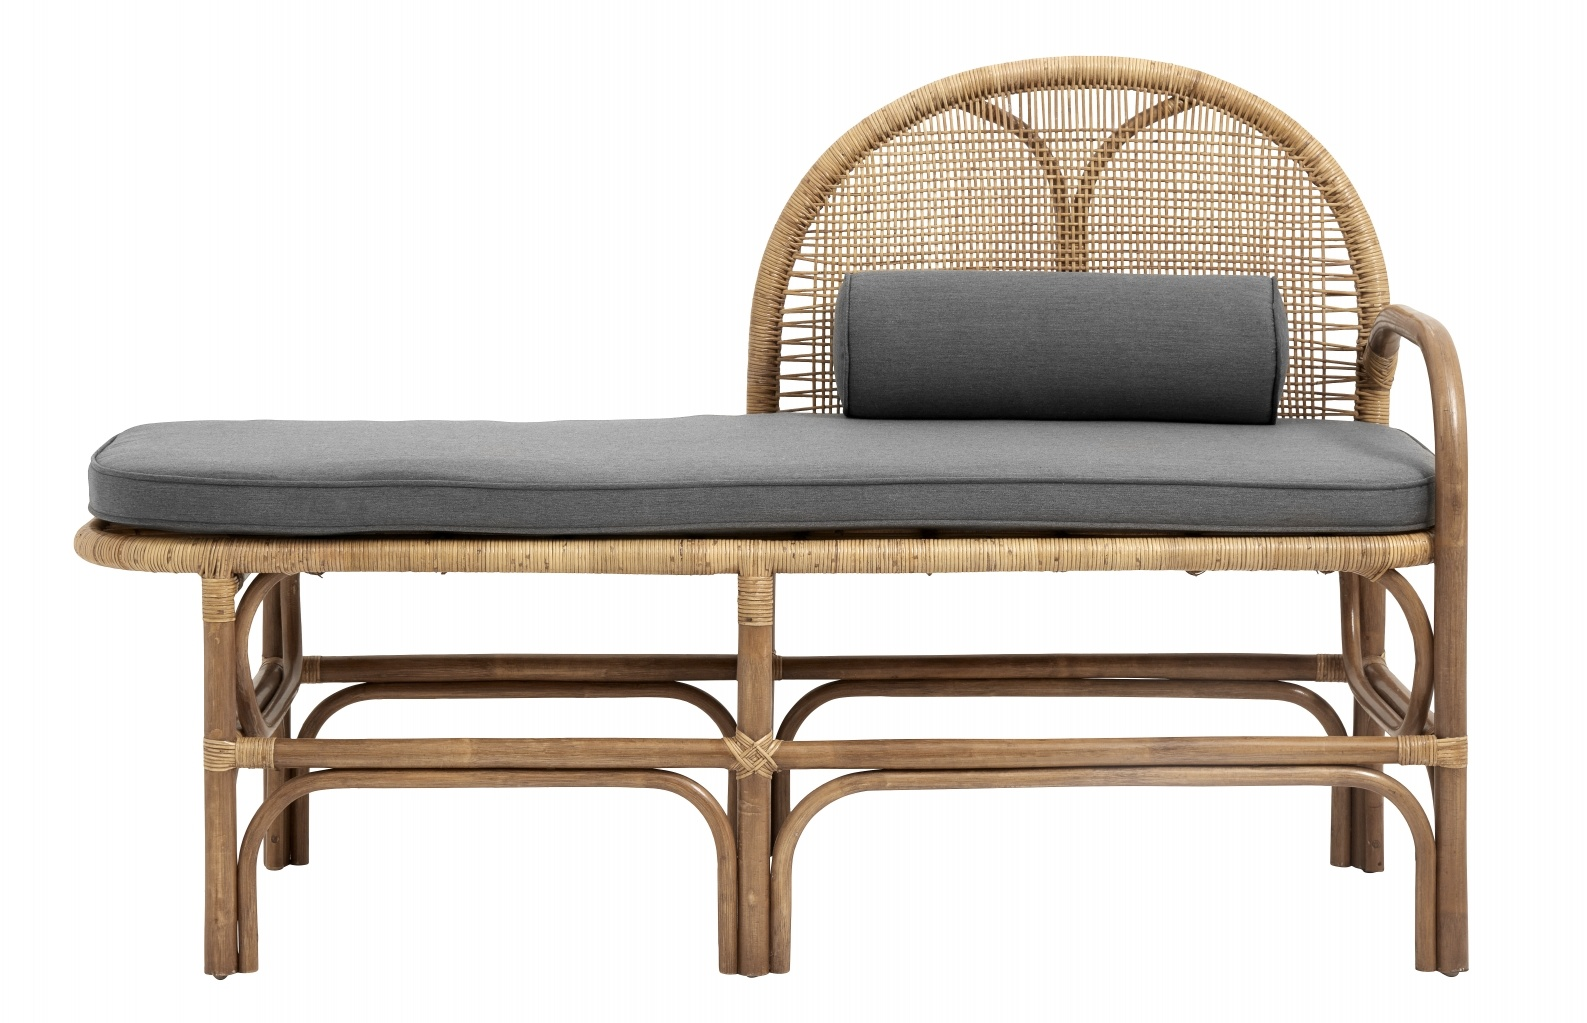 Full Size of Rattan Sofa Indoor Vintage Set Furniture Table Cover Outdoor Cushions Singapore For Sale Schweiz And Chairs Uk Bedroom Bedford Glass Dauerschläfer Himolla Sofa Rattan Sofa